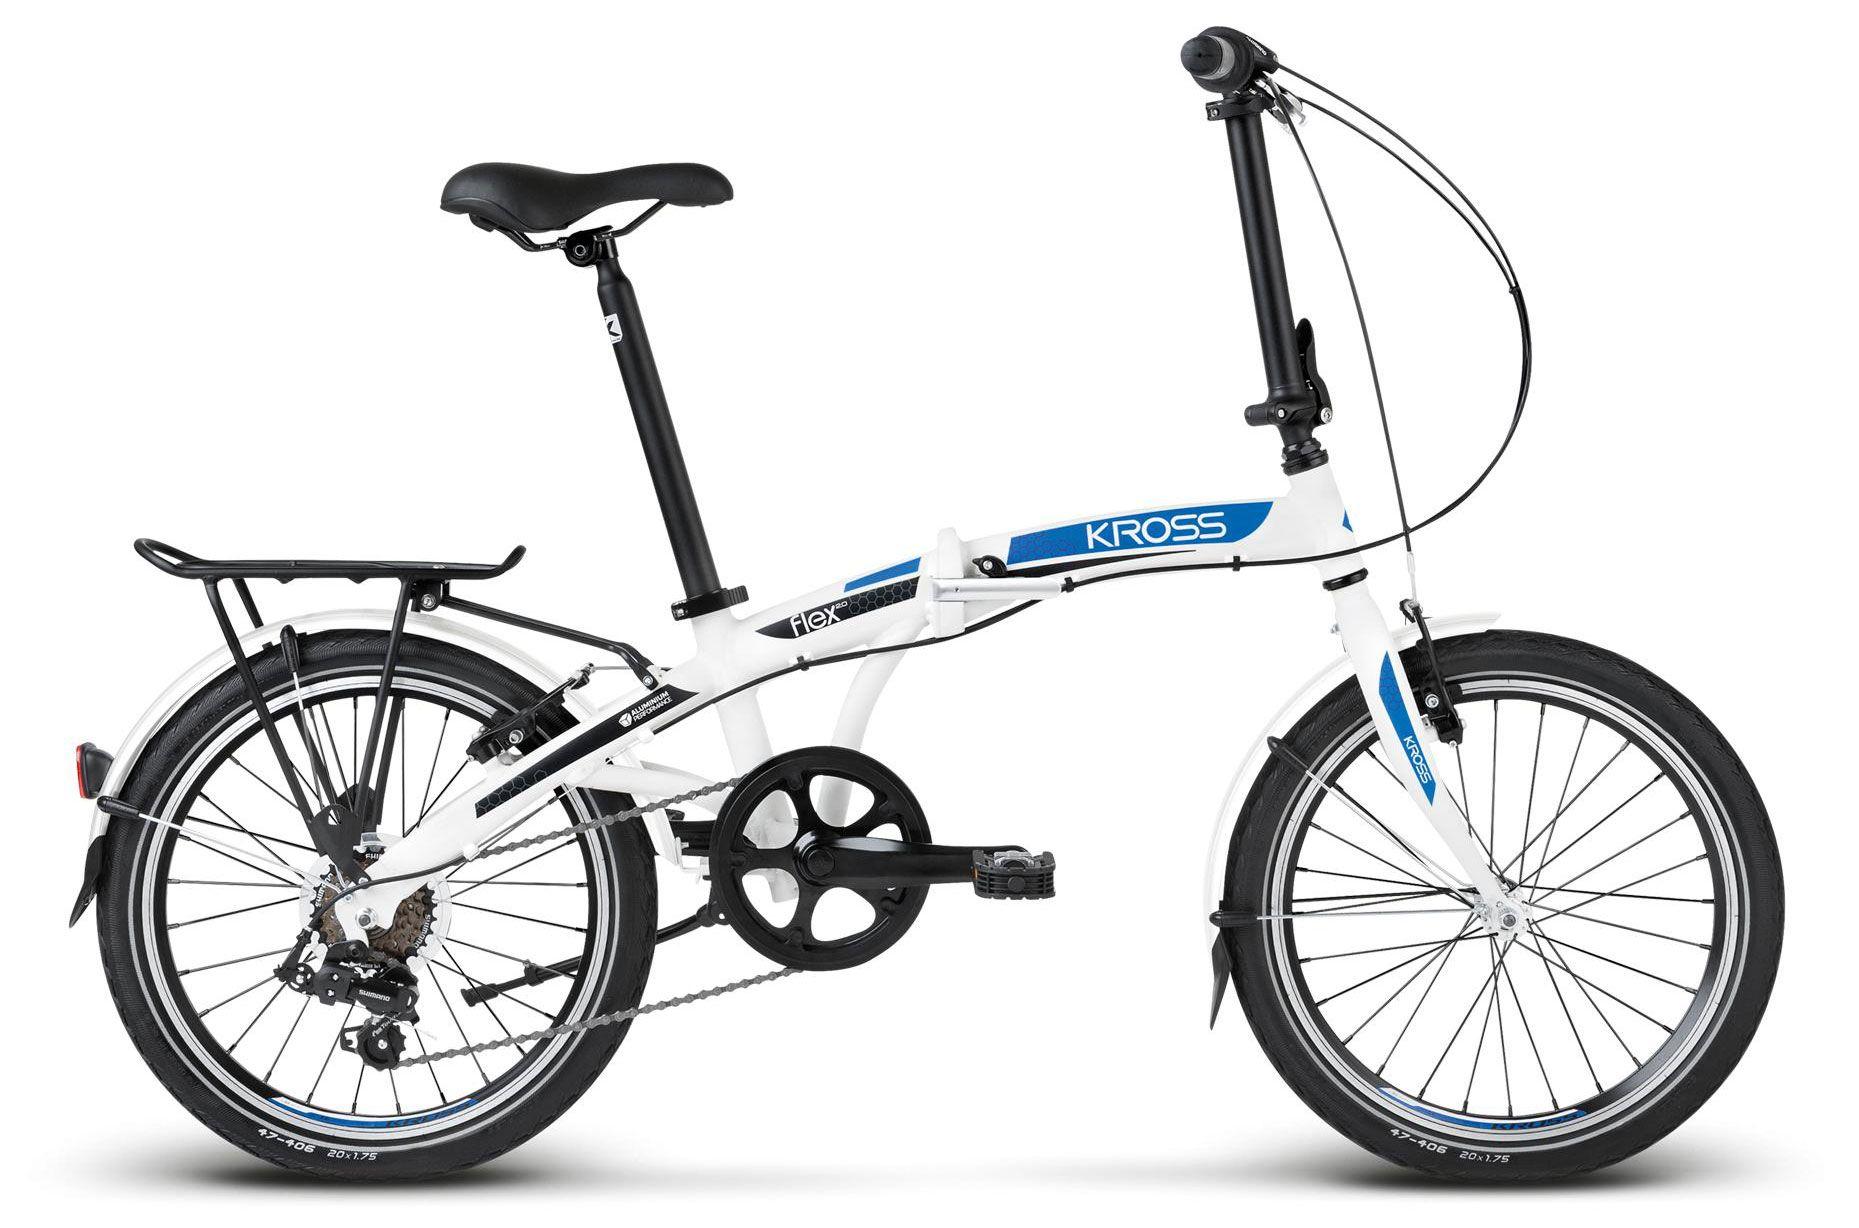 Велосипед KROSS FLEX 2.0 2017 велосипед kross flex 3 0 2015